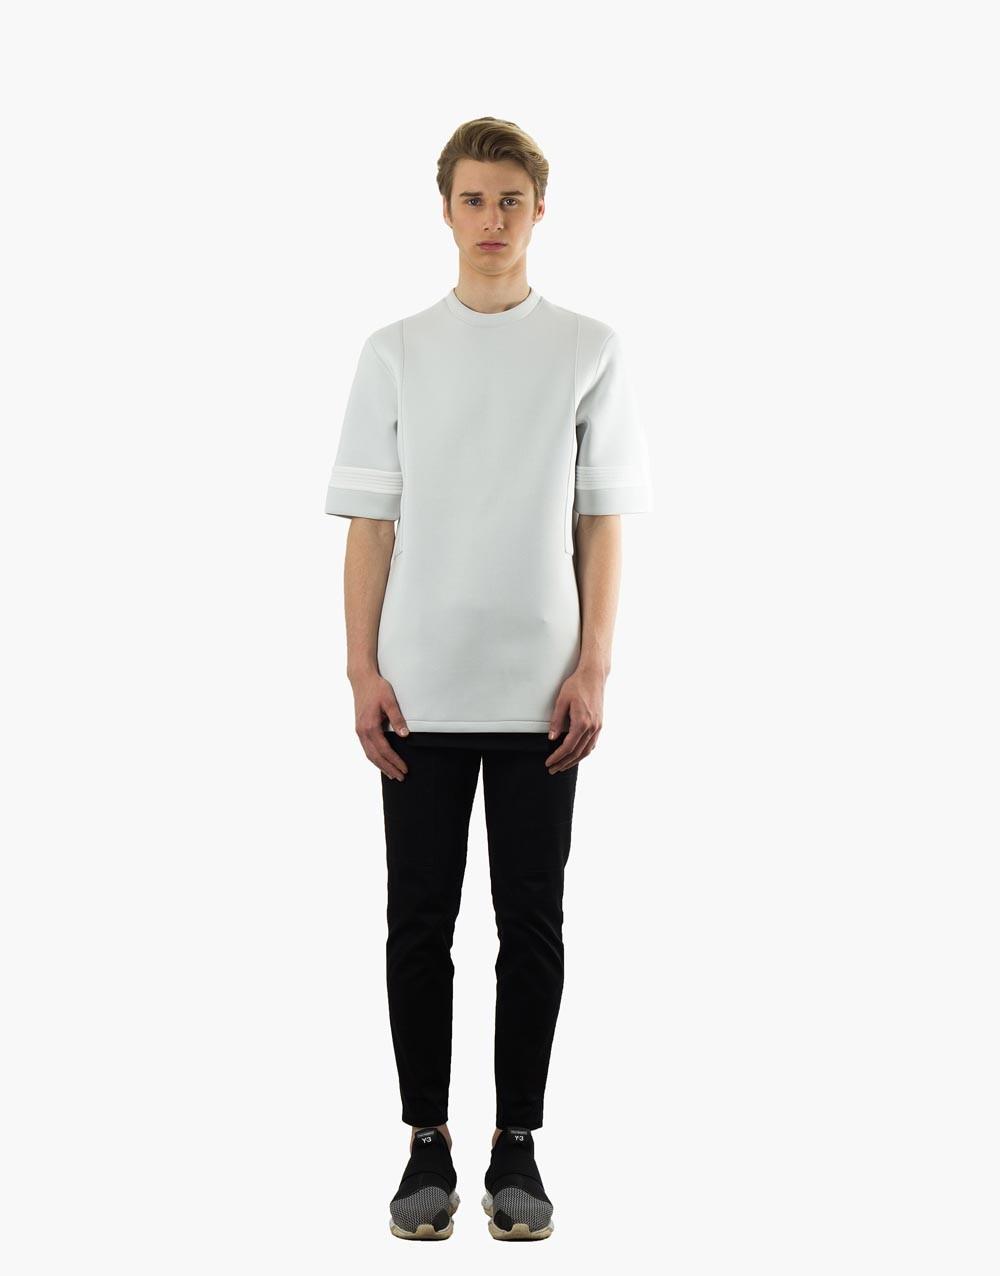 KEN t-shirt white front